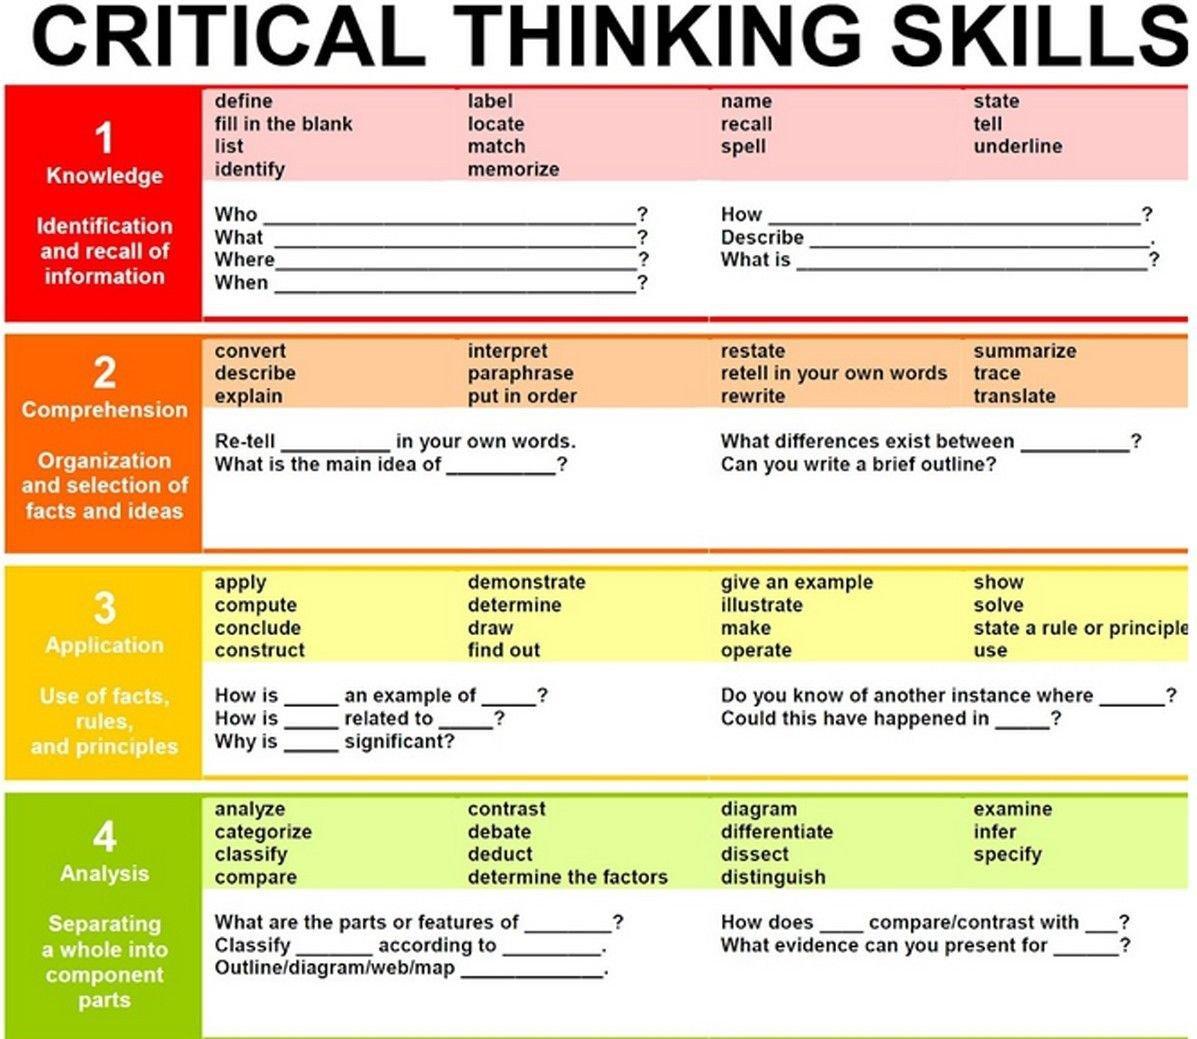 Critical Thinking Classroom Wall Print POSTER Decor 32x24